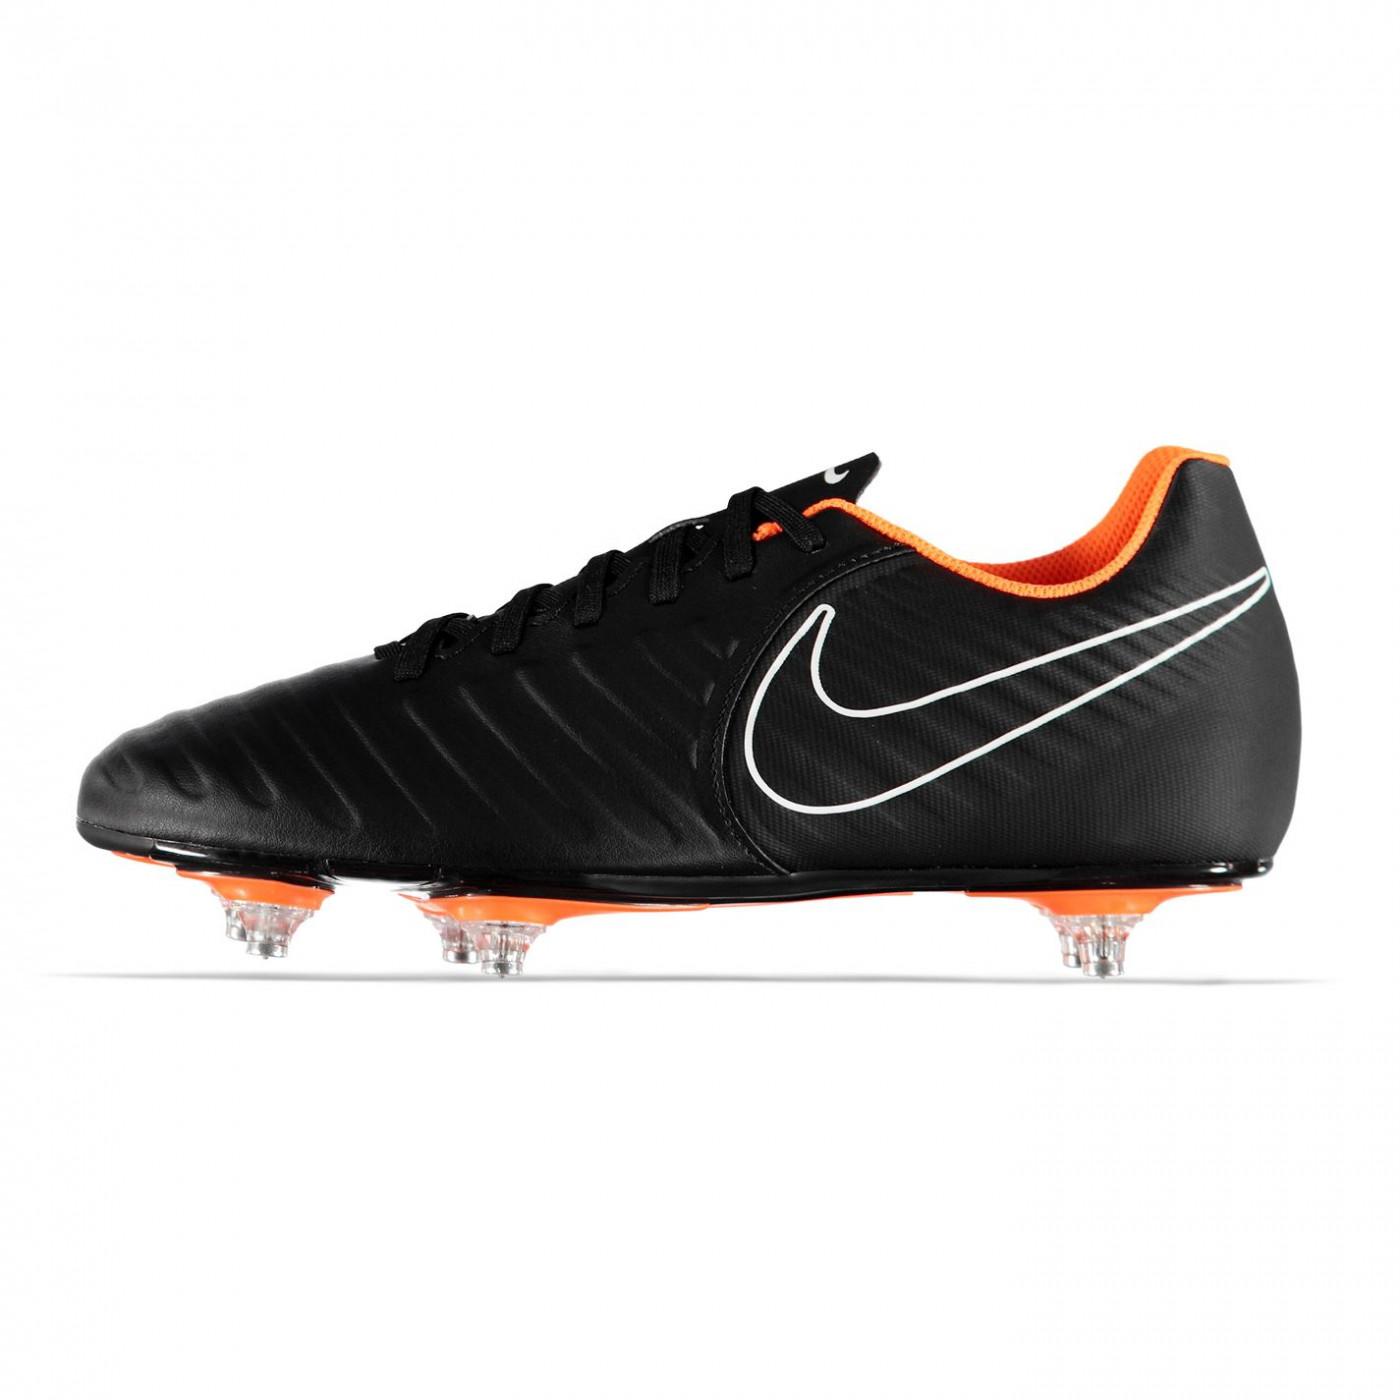 8309f78bd Nike Tiempo Legend Club Mens SG Football Boots - ALIATIC